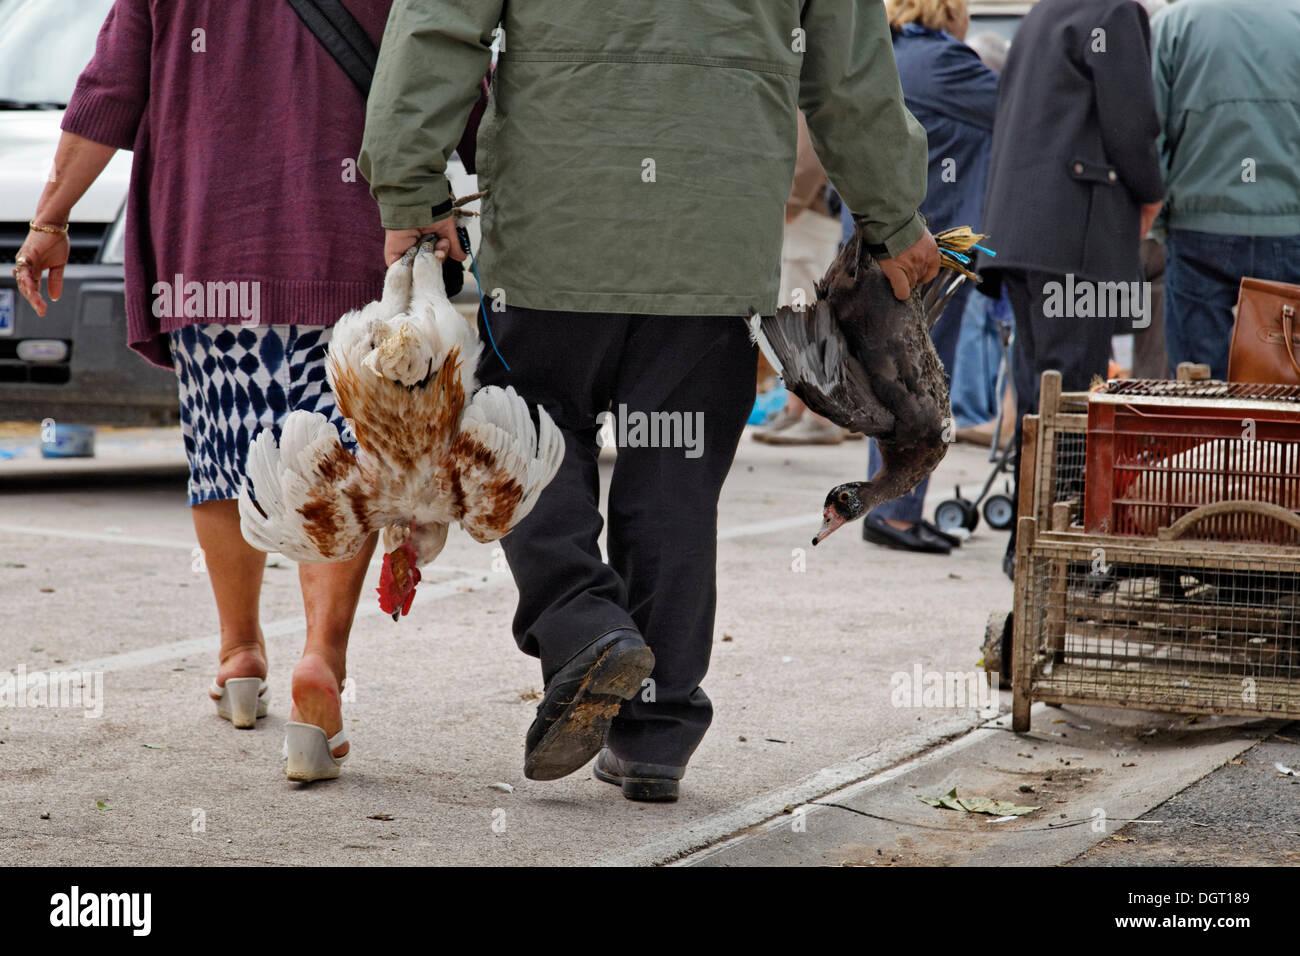 Louhans poultry market in Bresse every Monday morning, Tournus, Burgundy region, department of Saône-et-Loire, France, Europe - Stock Image